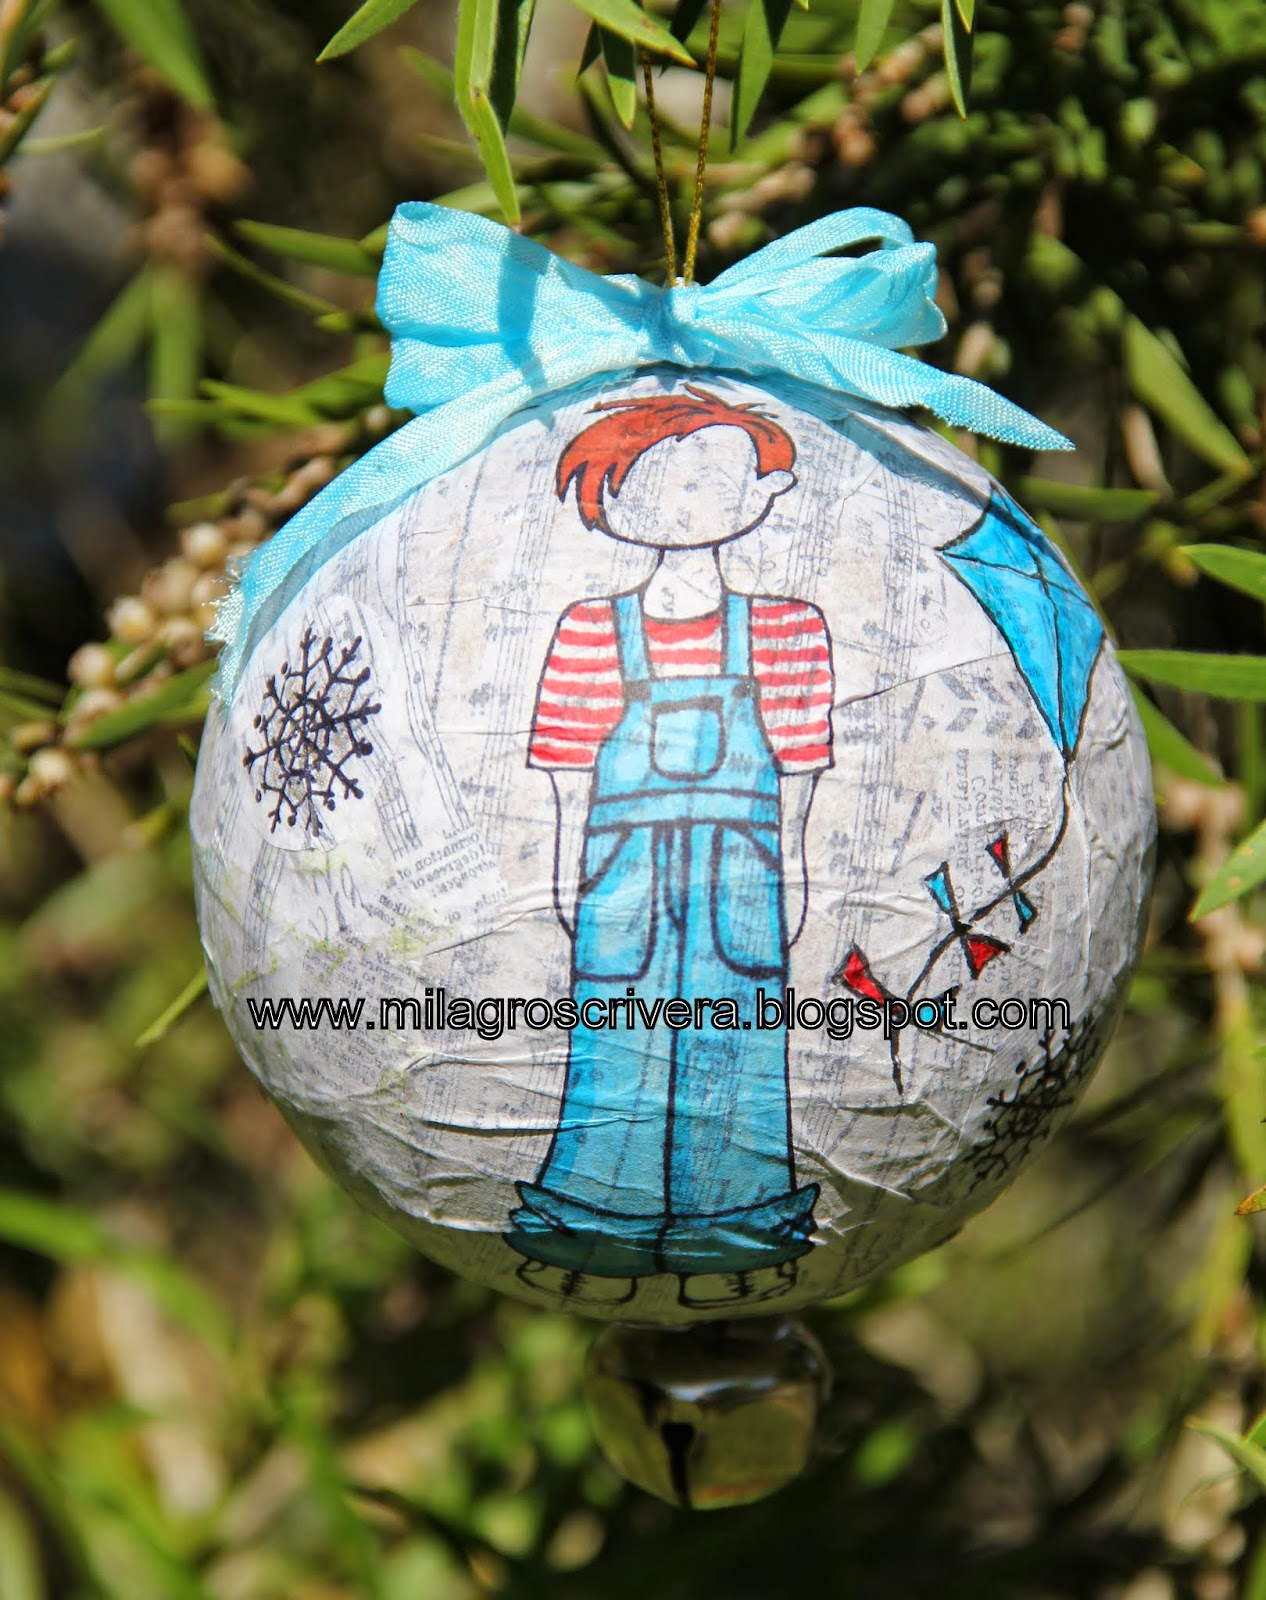 http://milagroscrivera.blogspot.com/2014/12/julie-nutting-toby-christmas-ornament.html